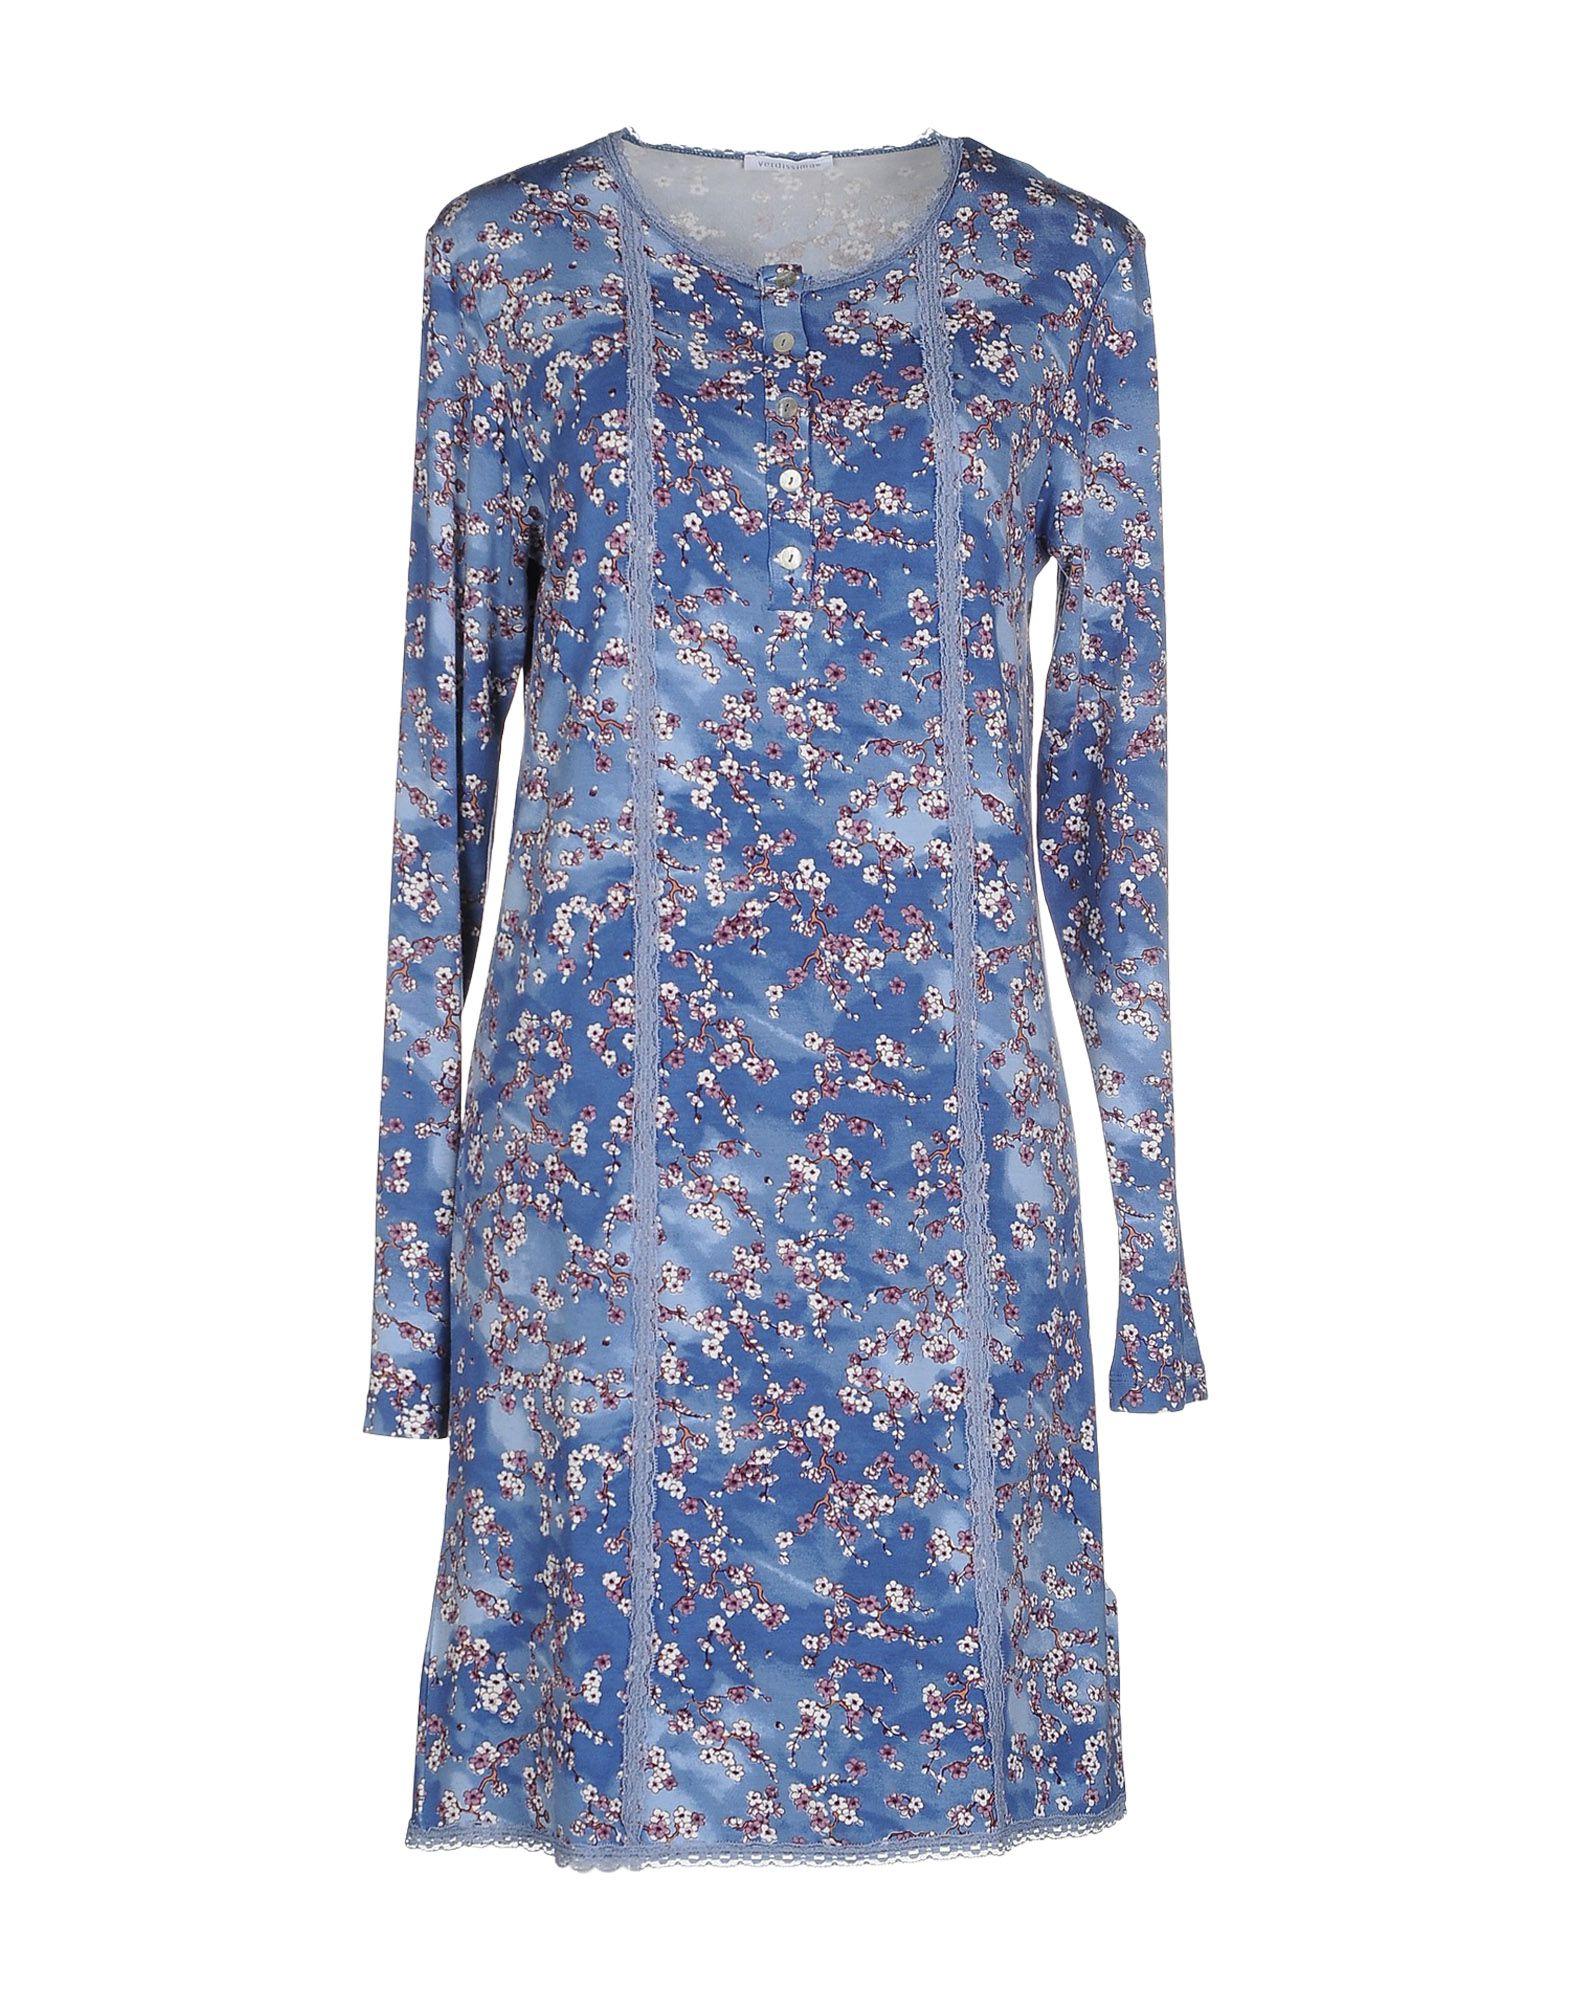 VERDISSIMA Damen Nachthemd Farbe Blaugrau Größe 4